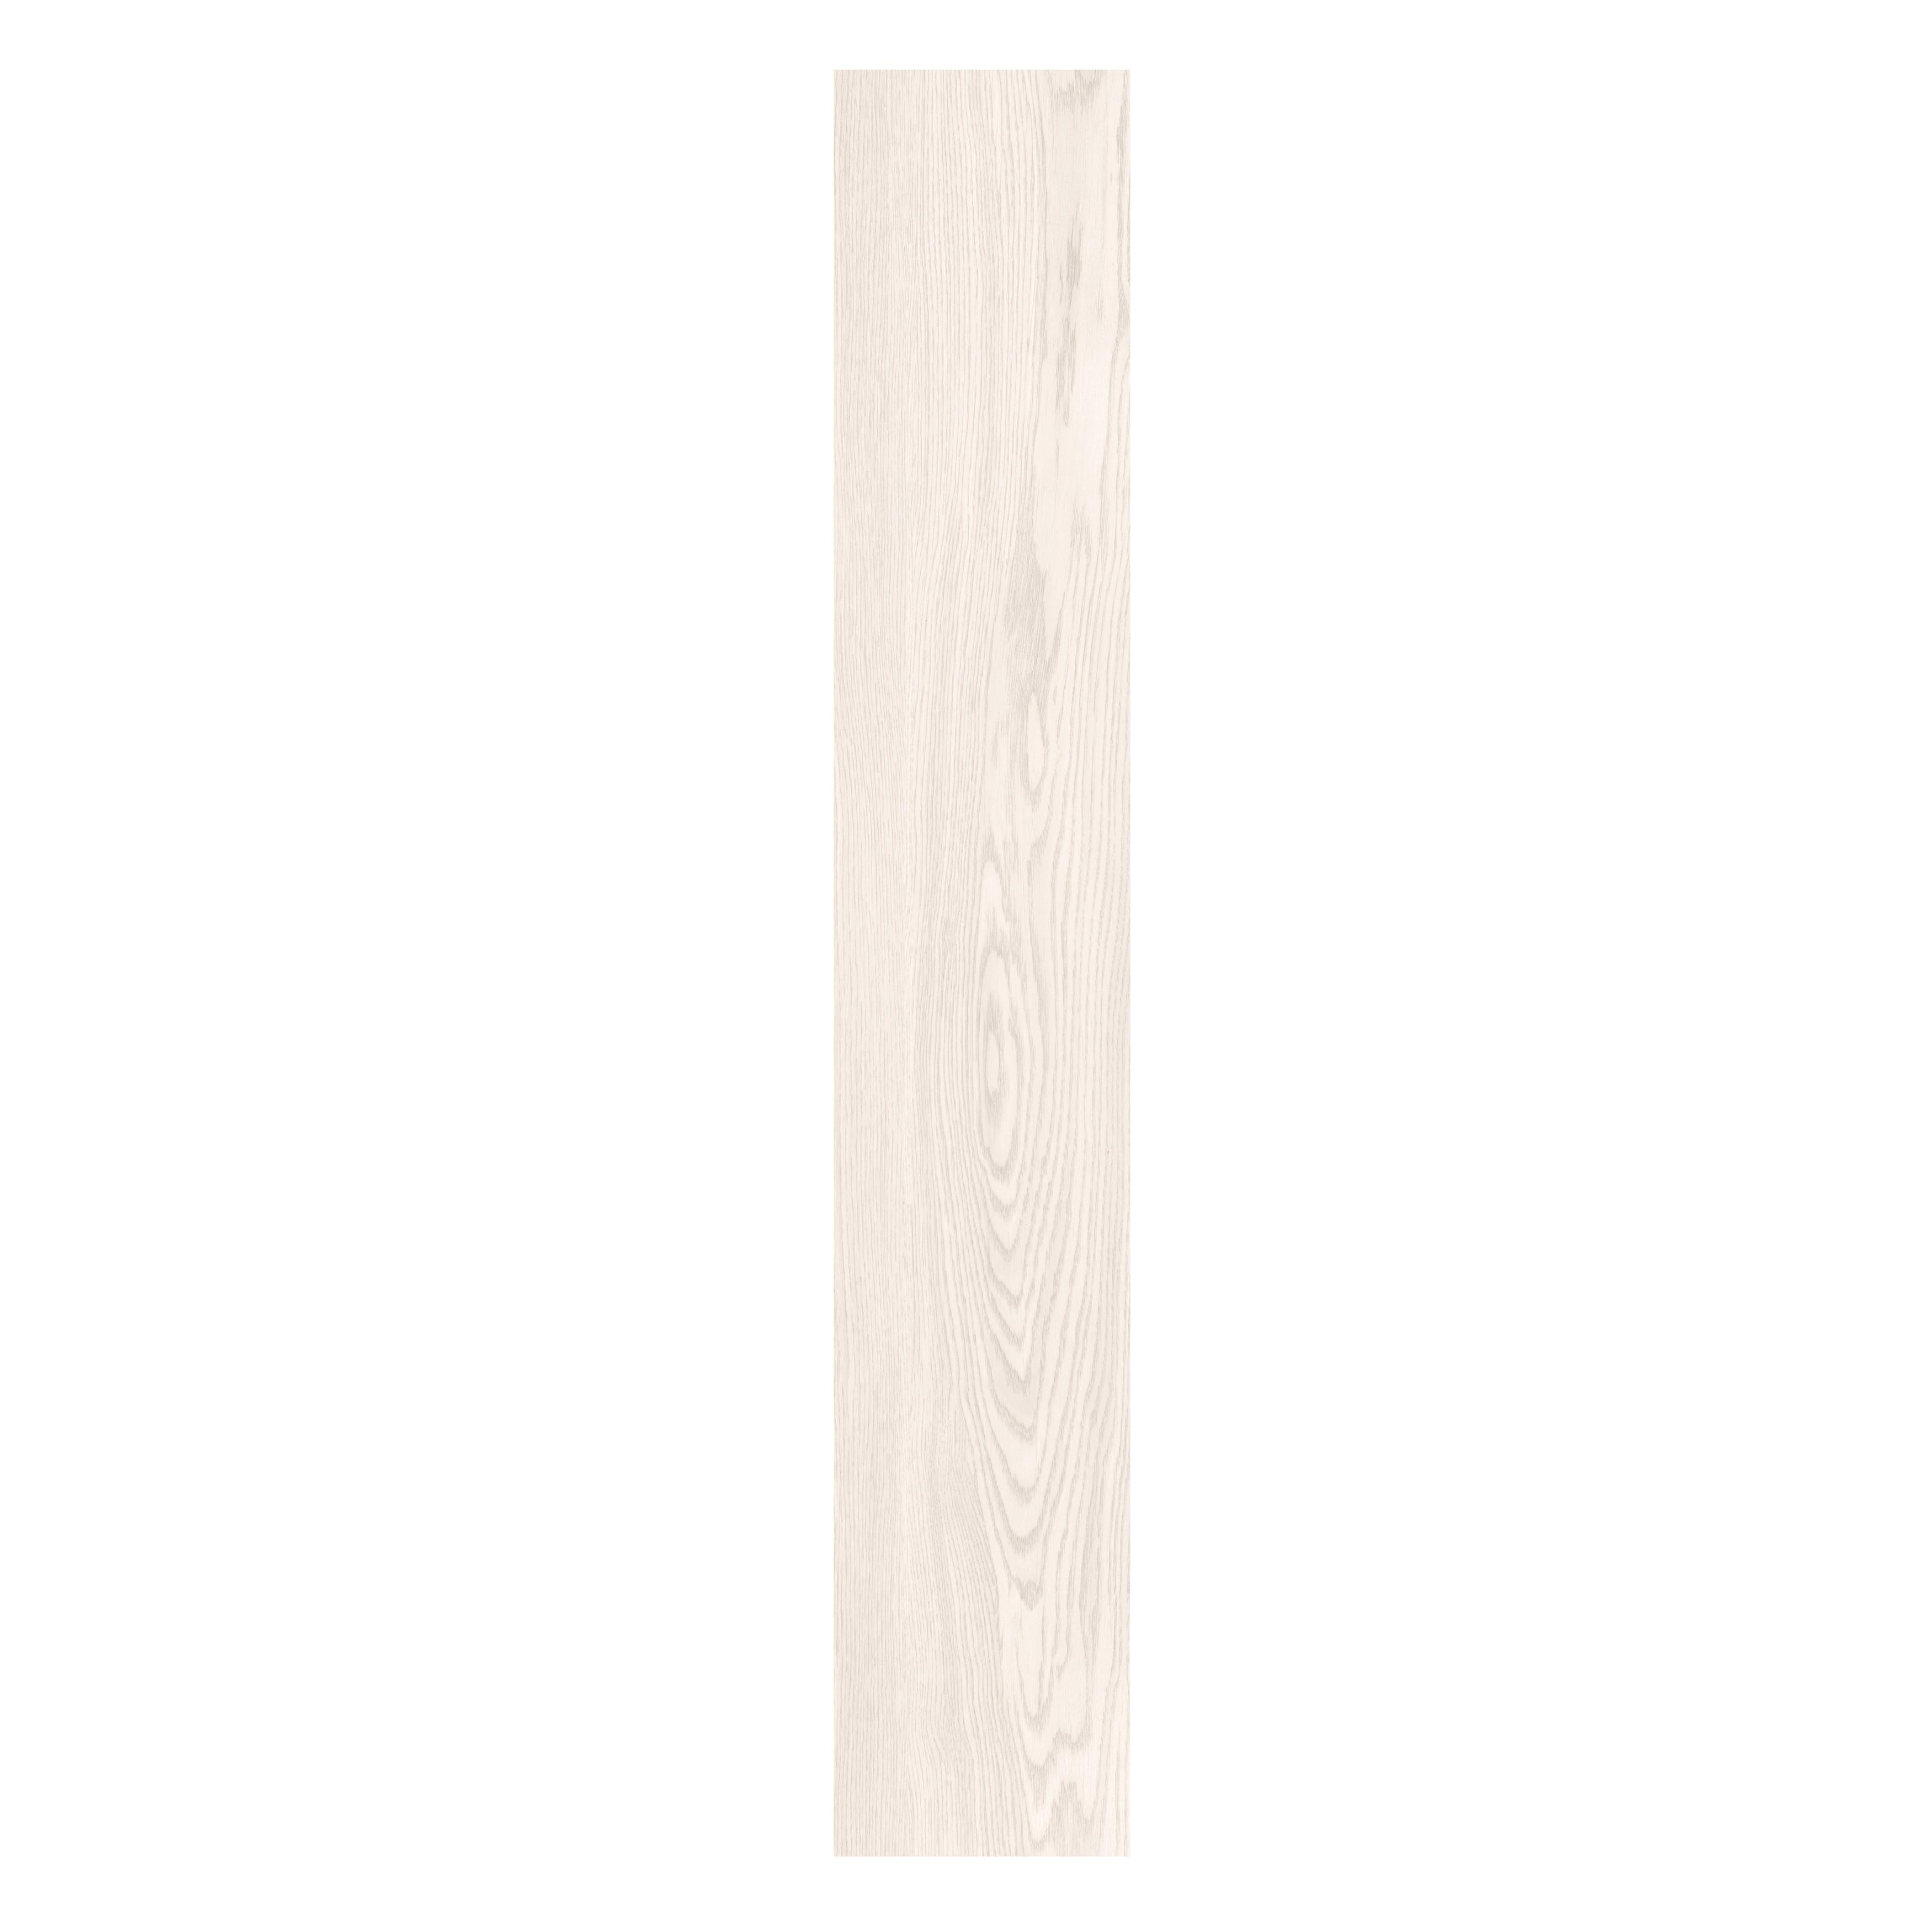 Shop Achim Nexus White Oak 6x36 Self Adhesive Vinyl Floor Planks